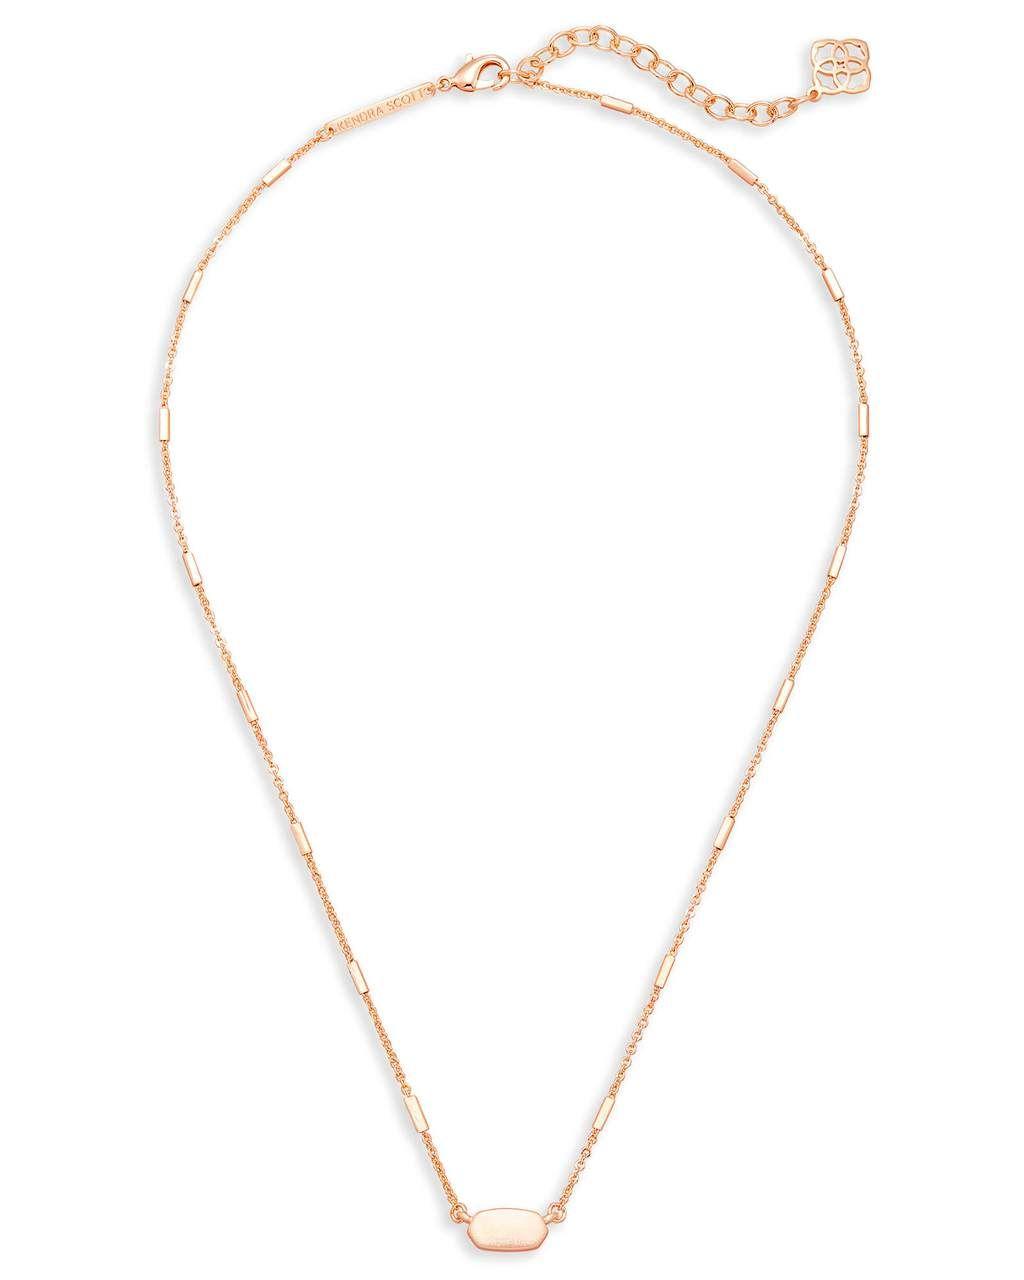 Kendra scott fern necklace rose gold in jewelry a girls